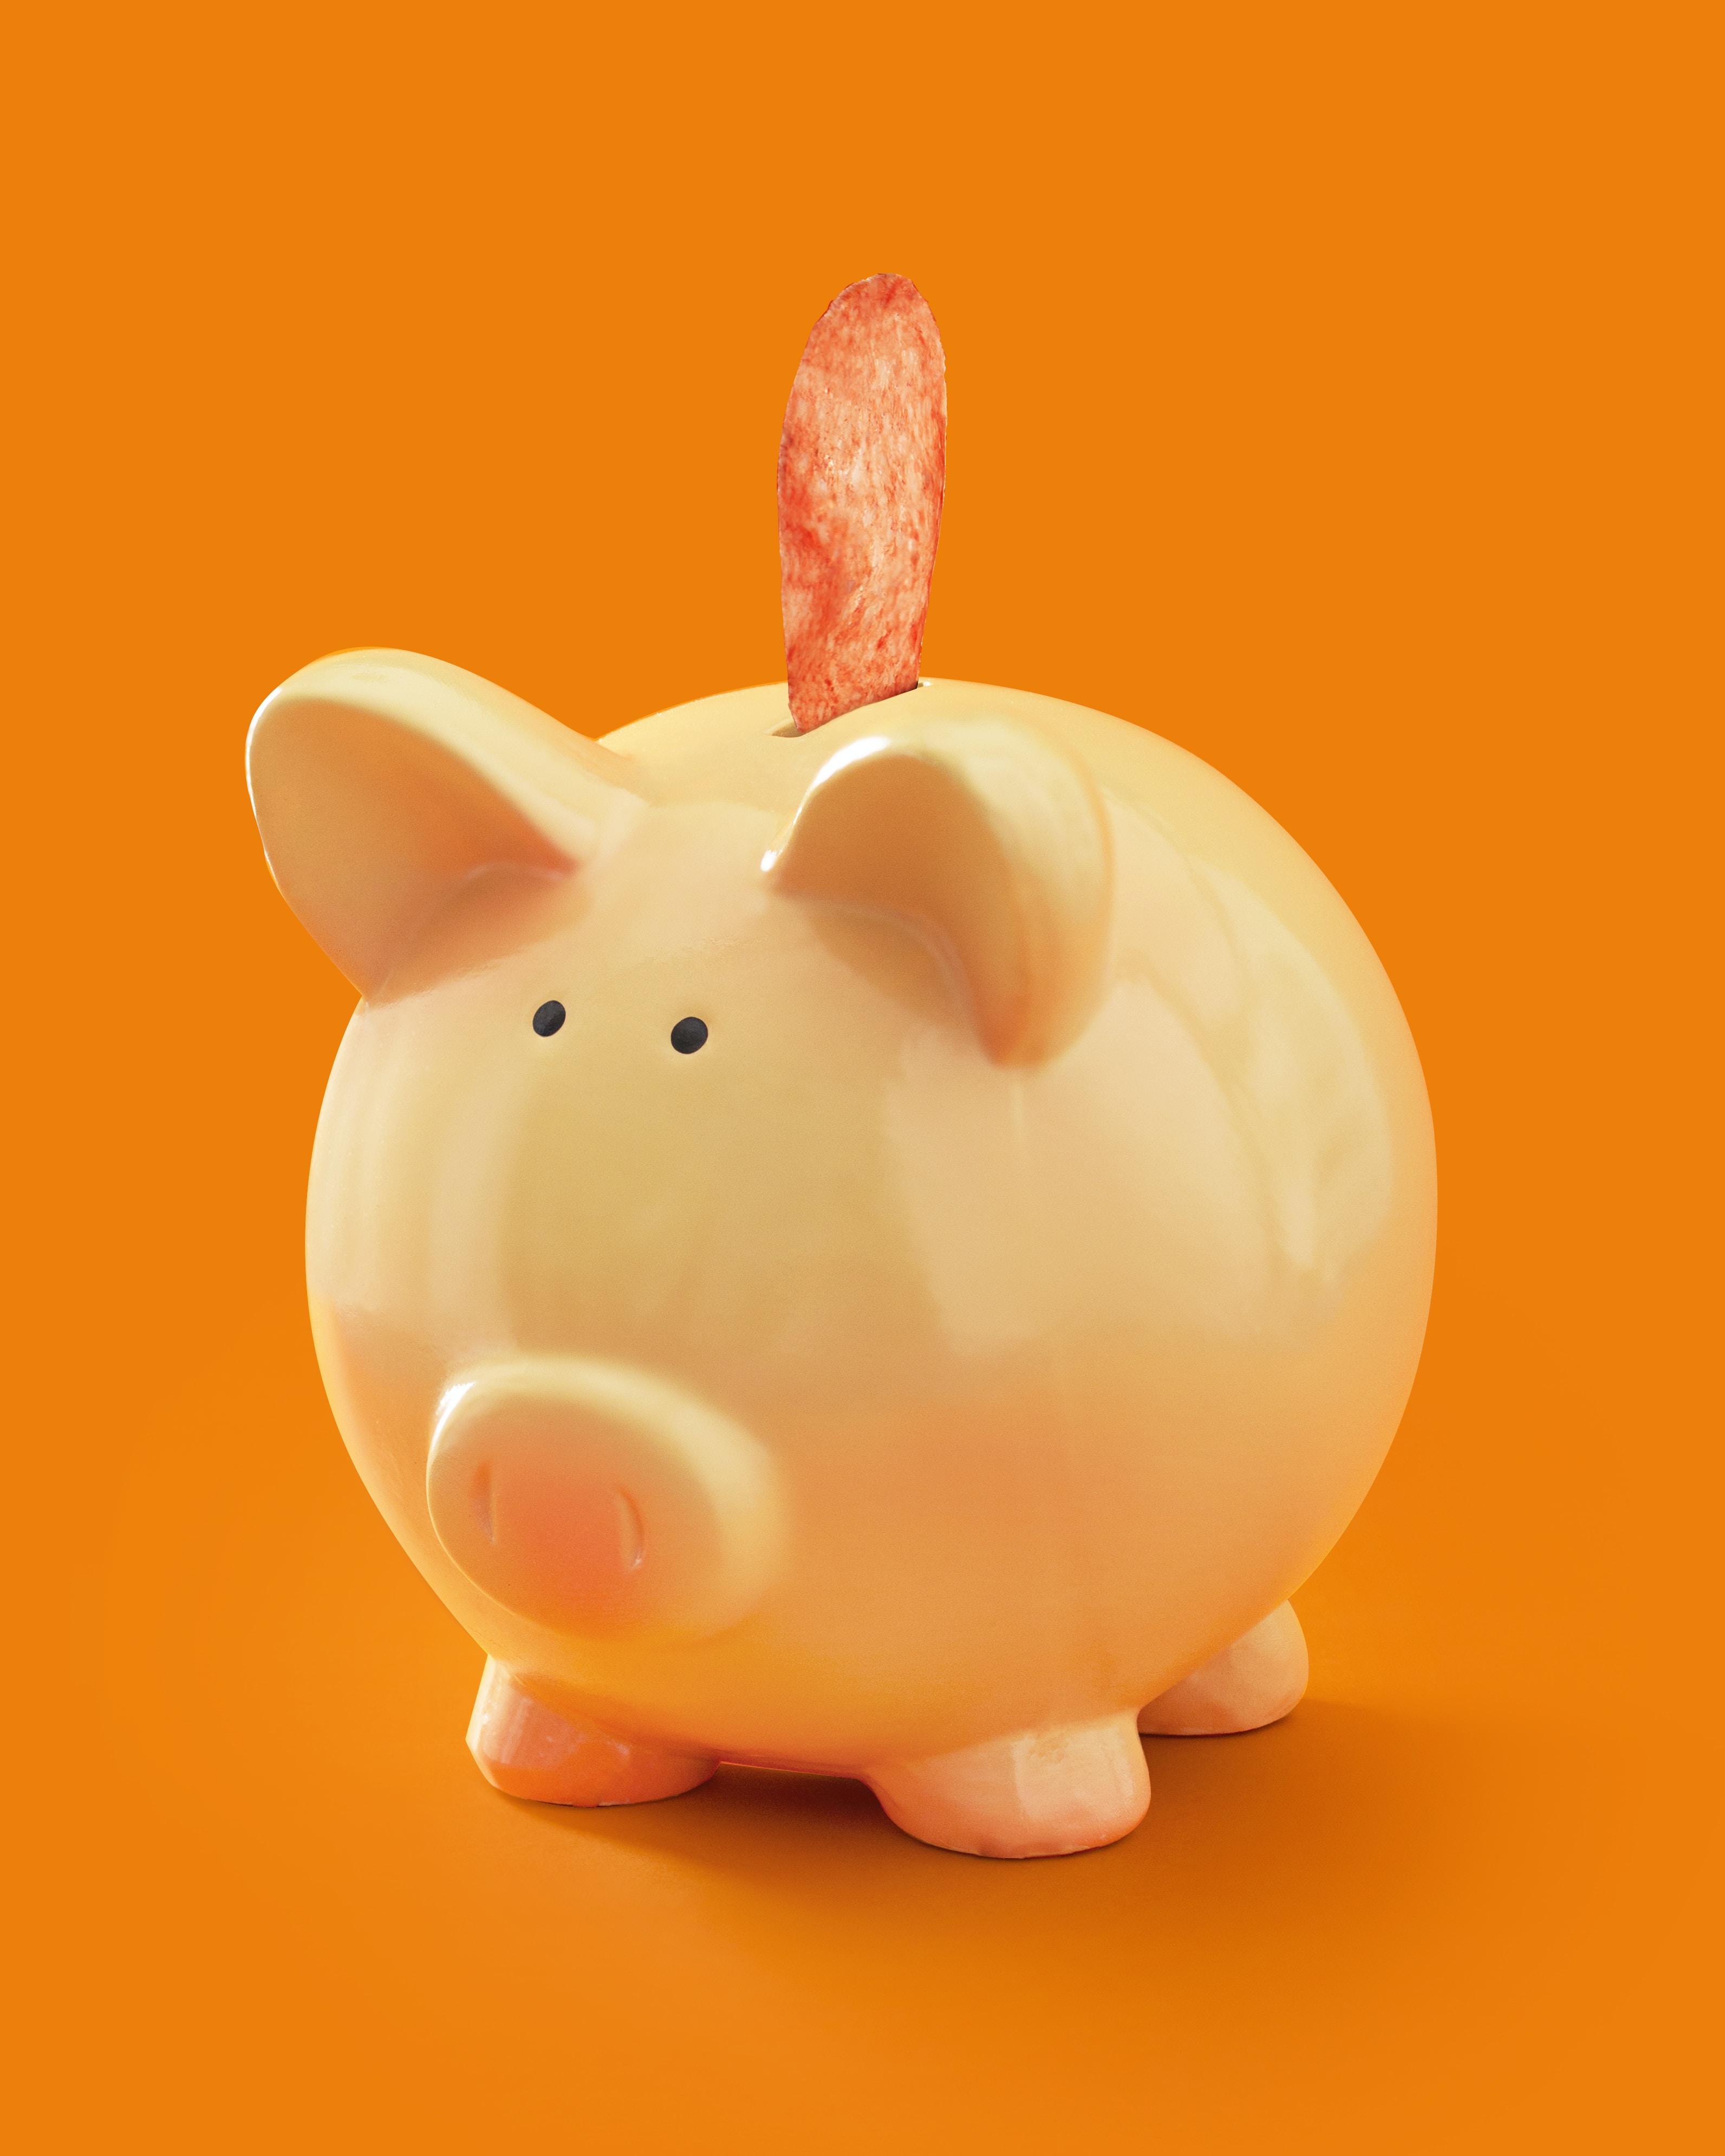 white ceramic piggy bank on orange surface